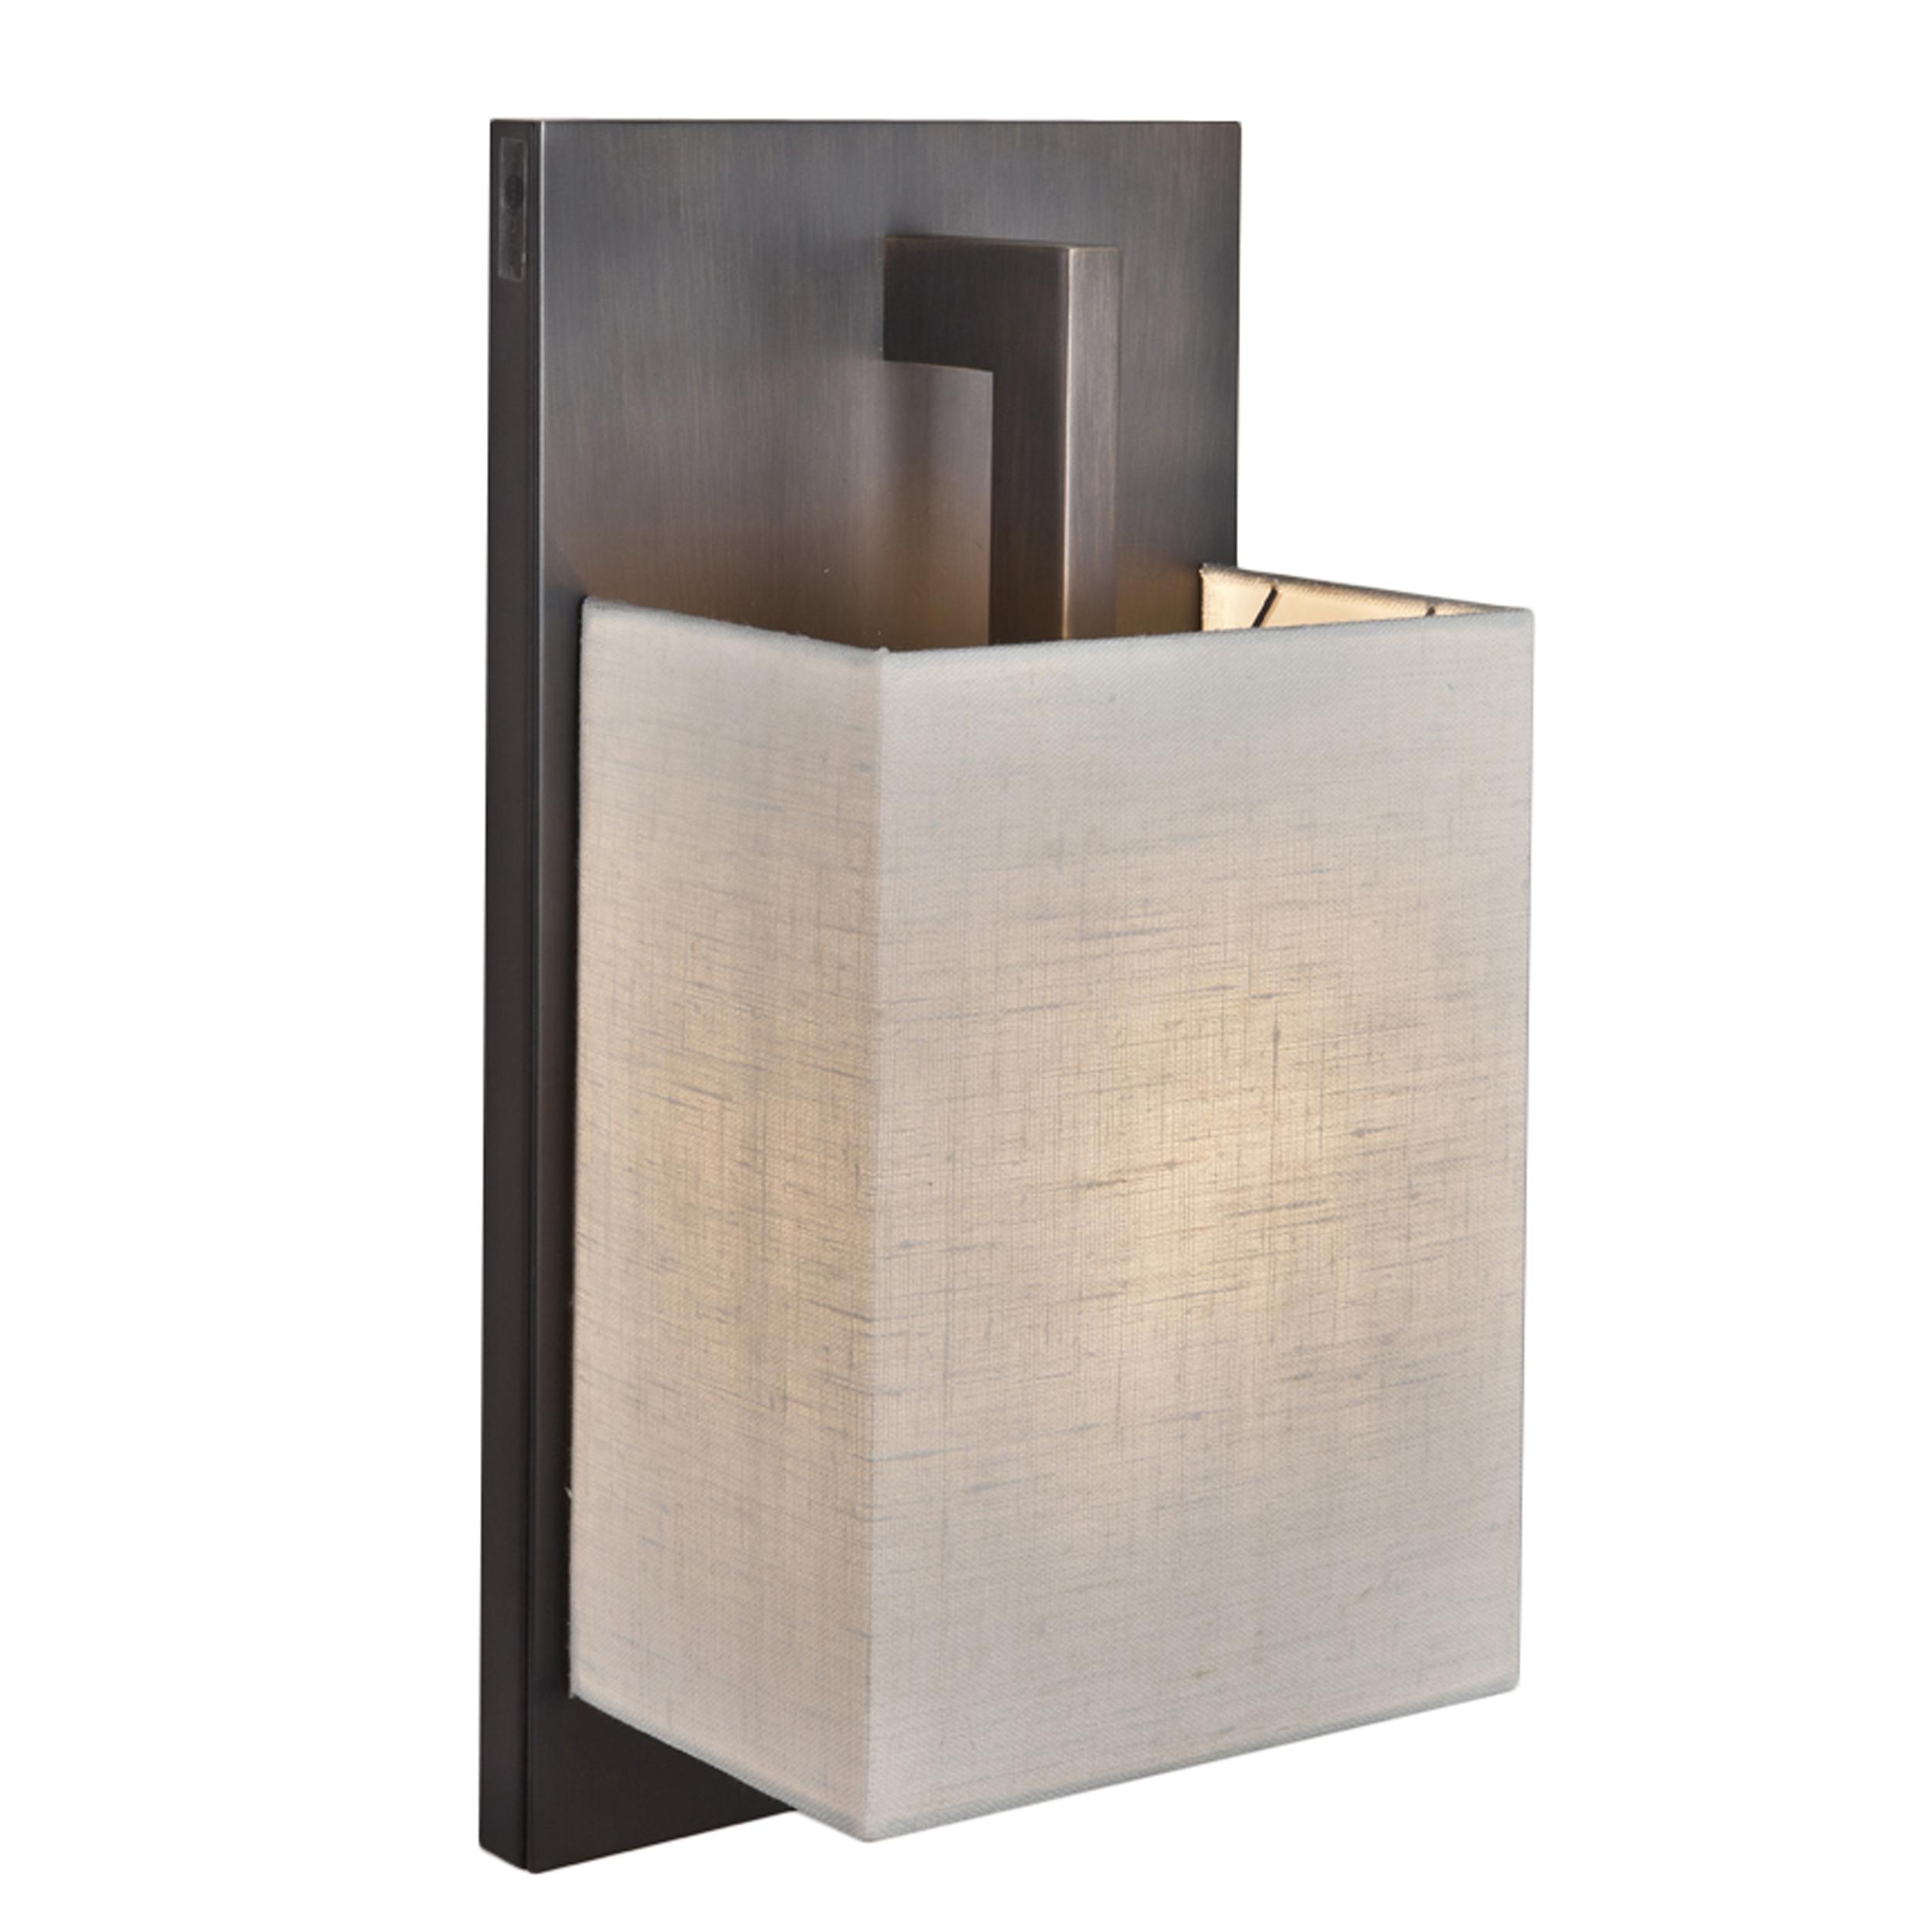 Contardi Coconette Ap Wall Light Satin Bronze White Linen